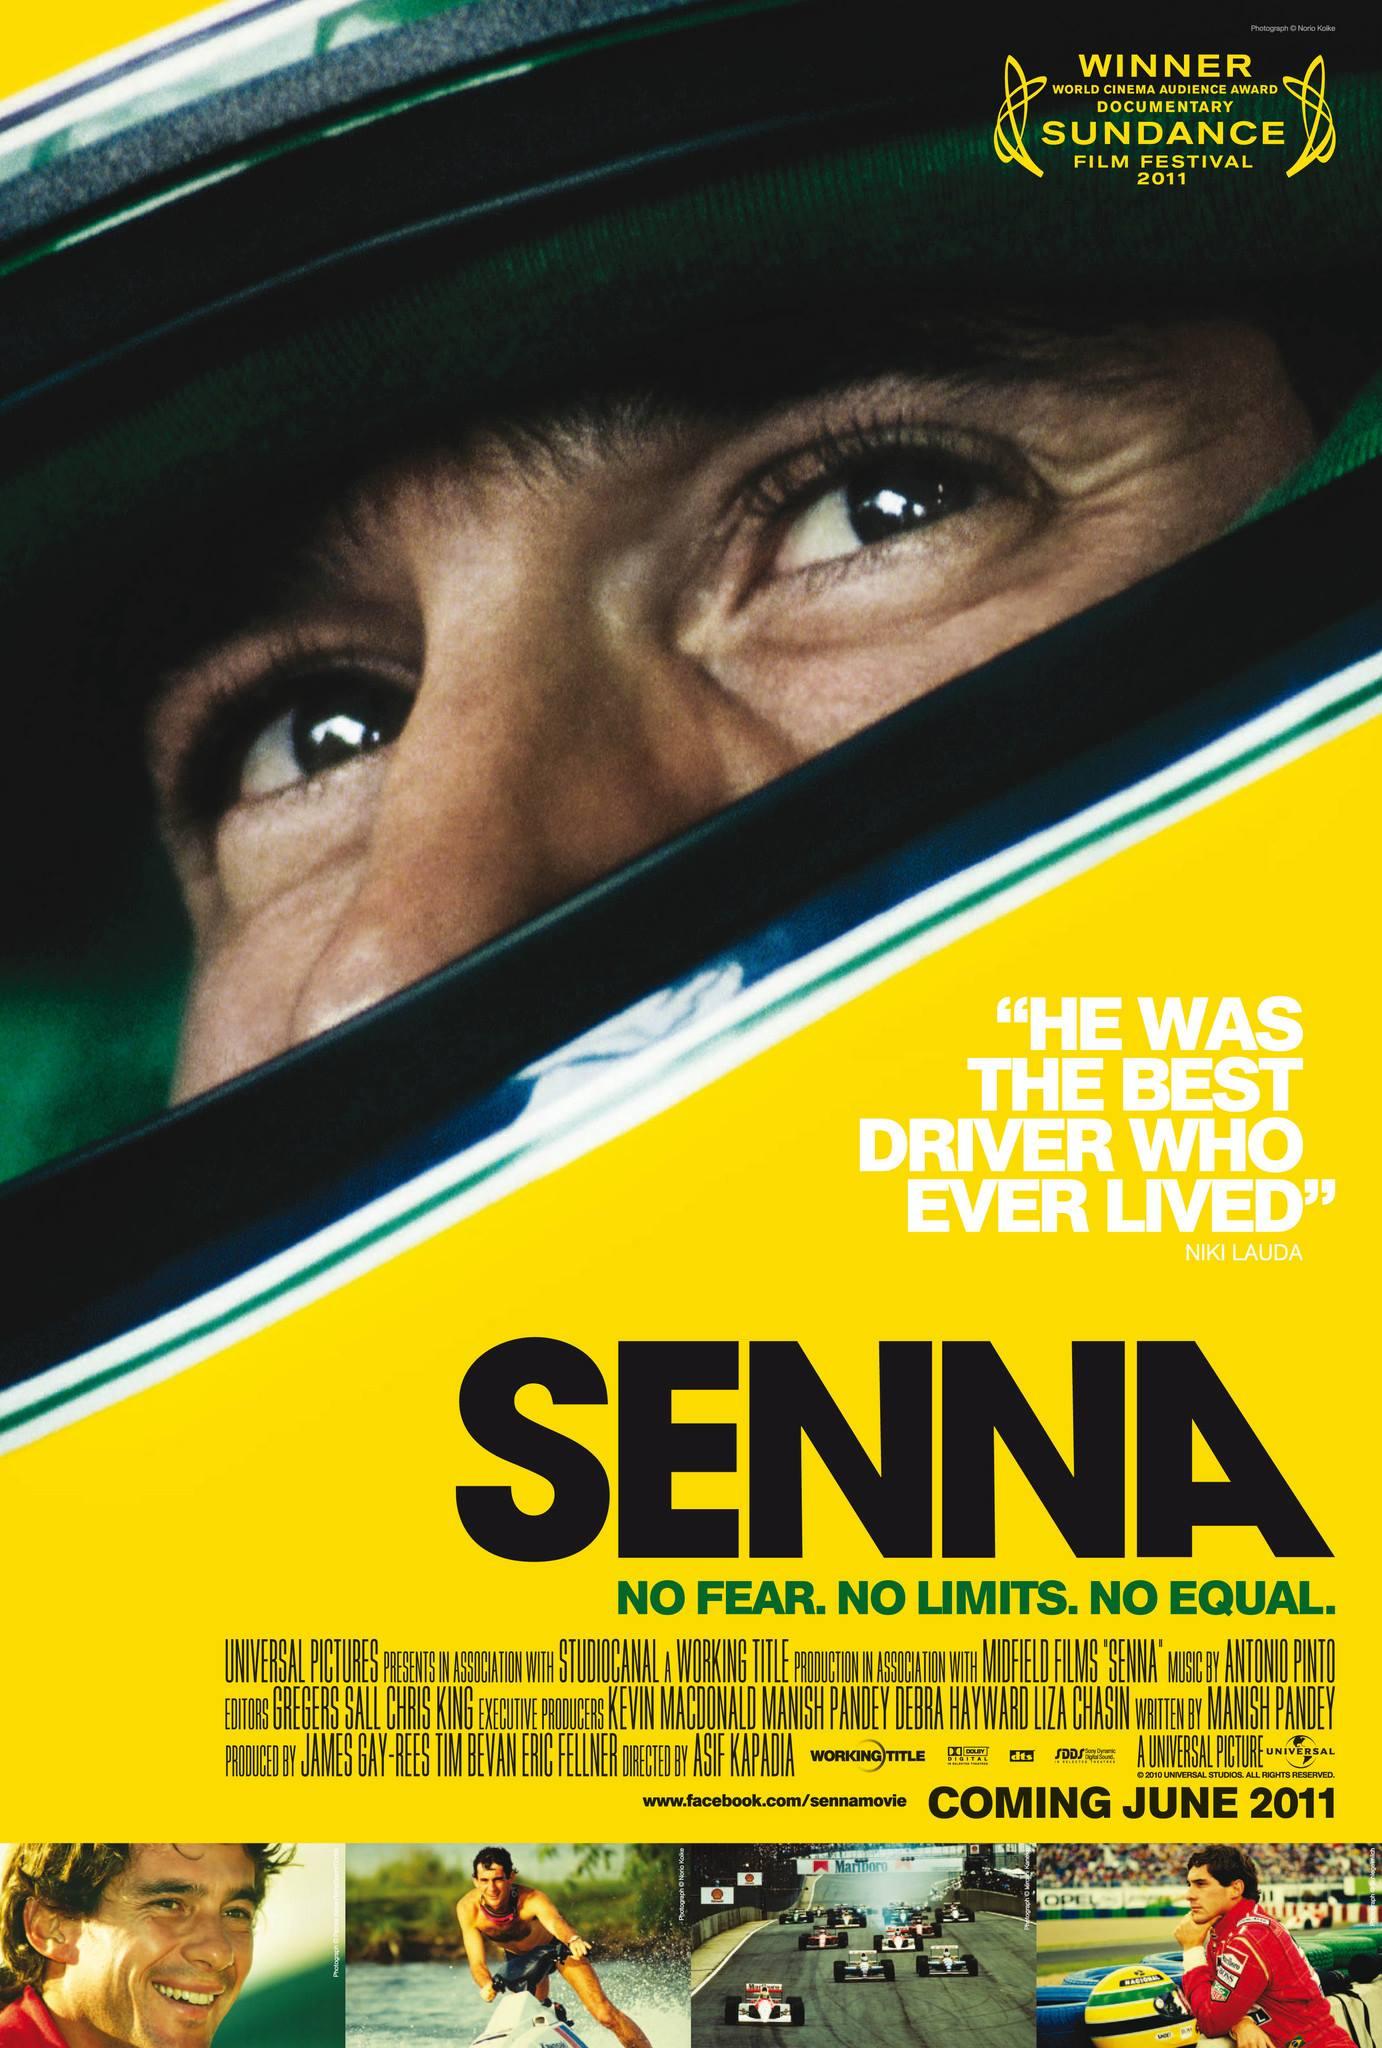 Senna film poster, designed by Creative Partnership